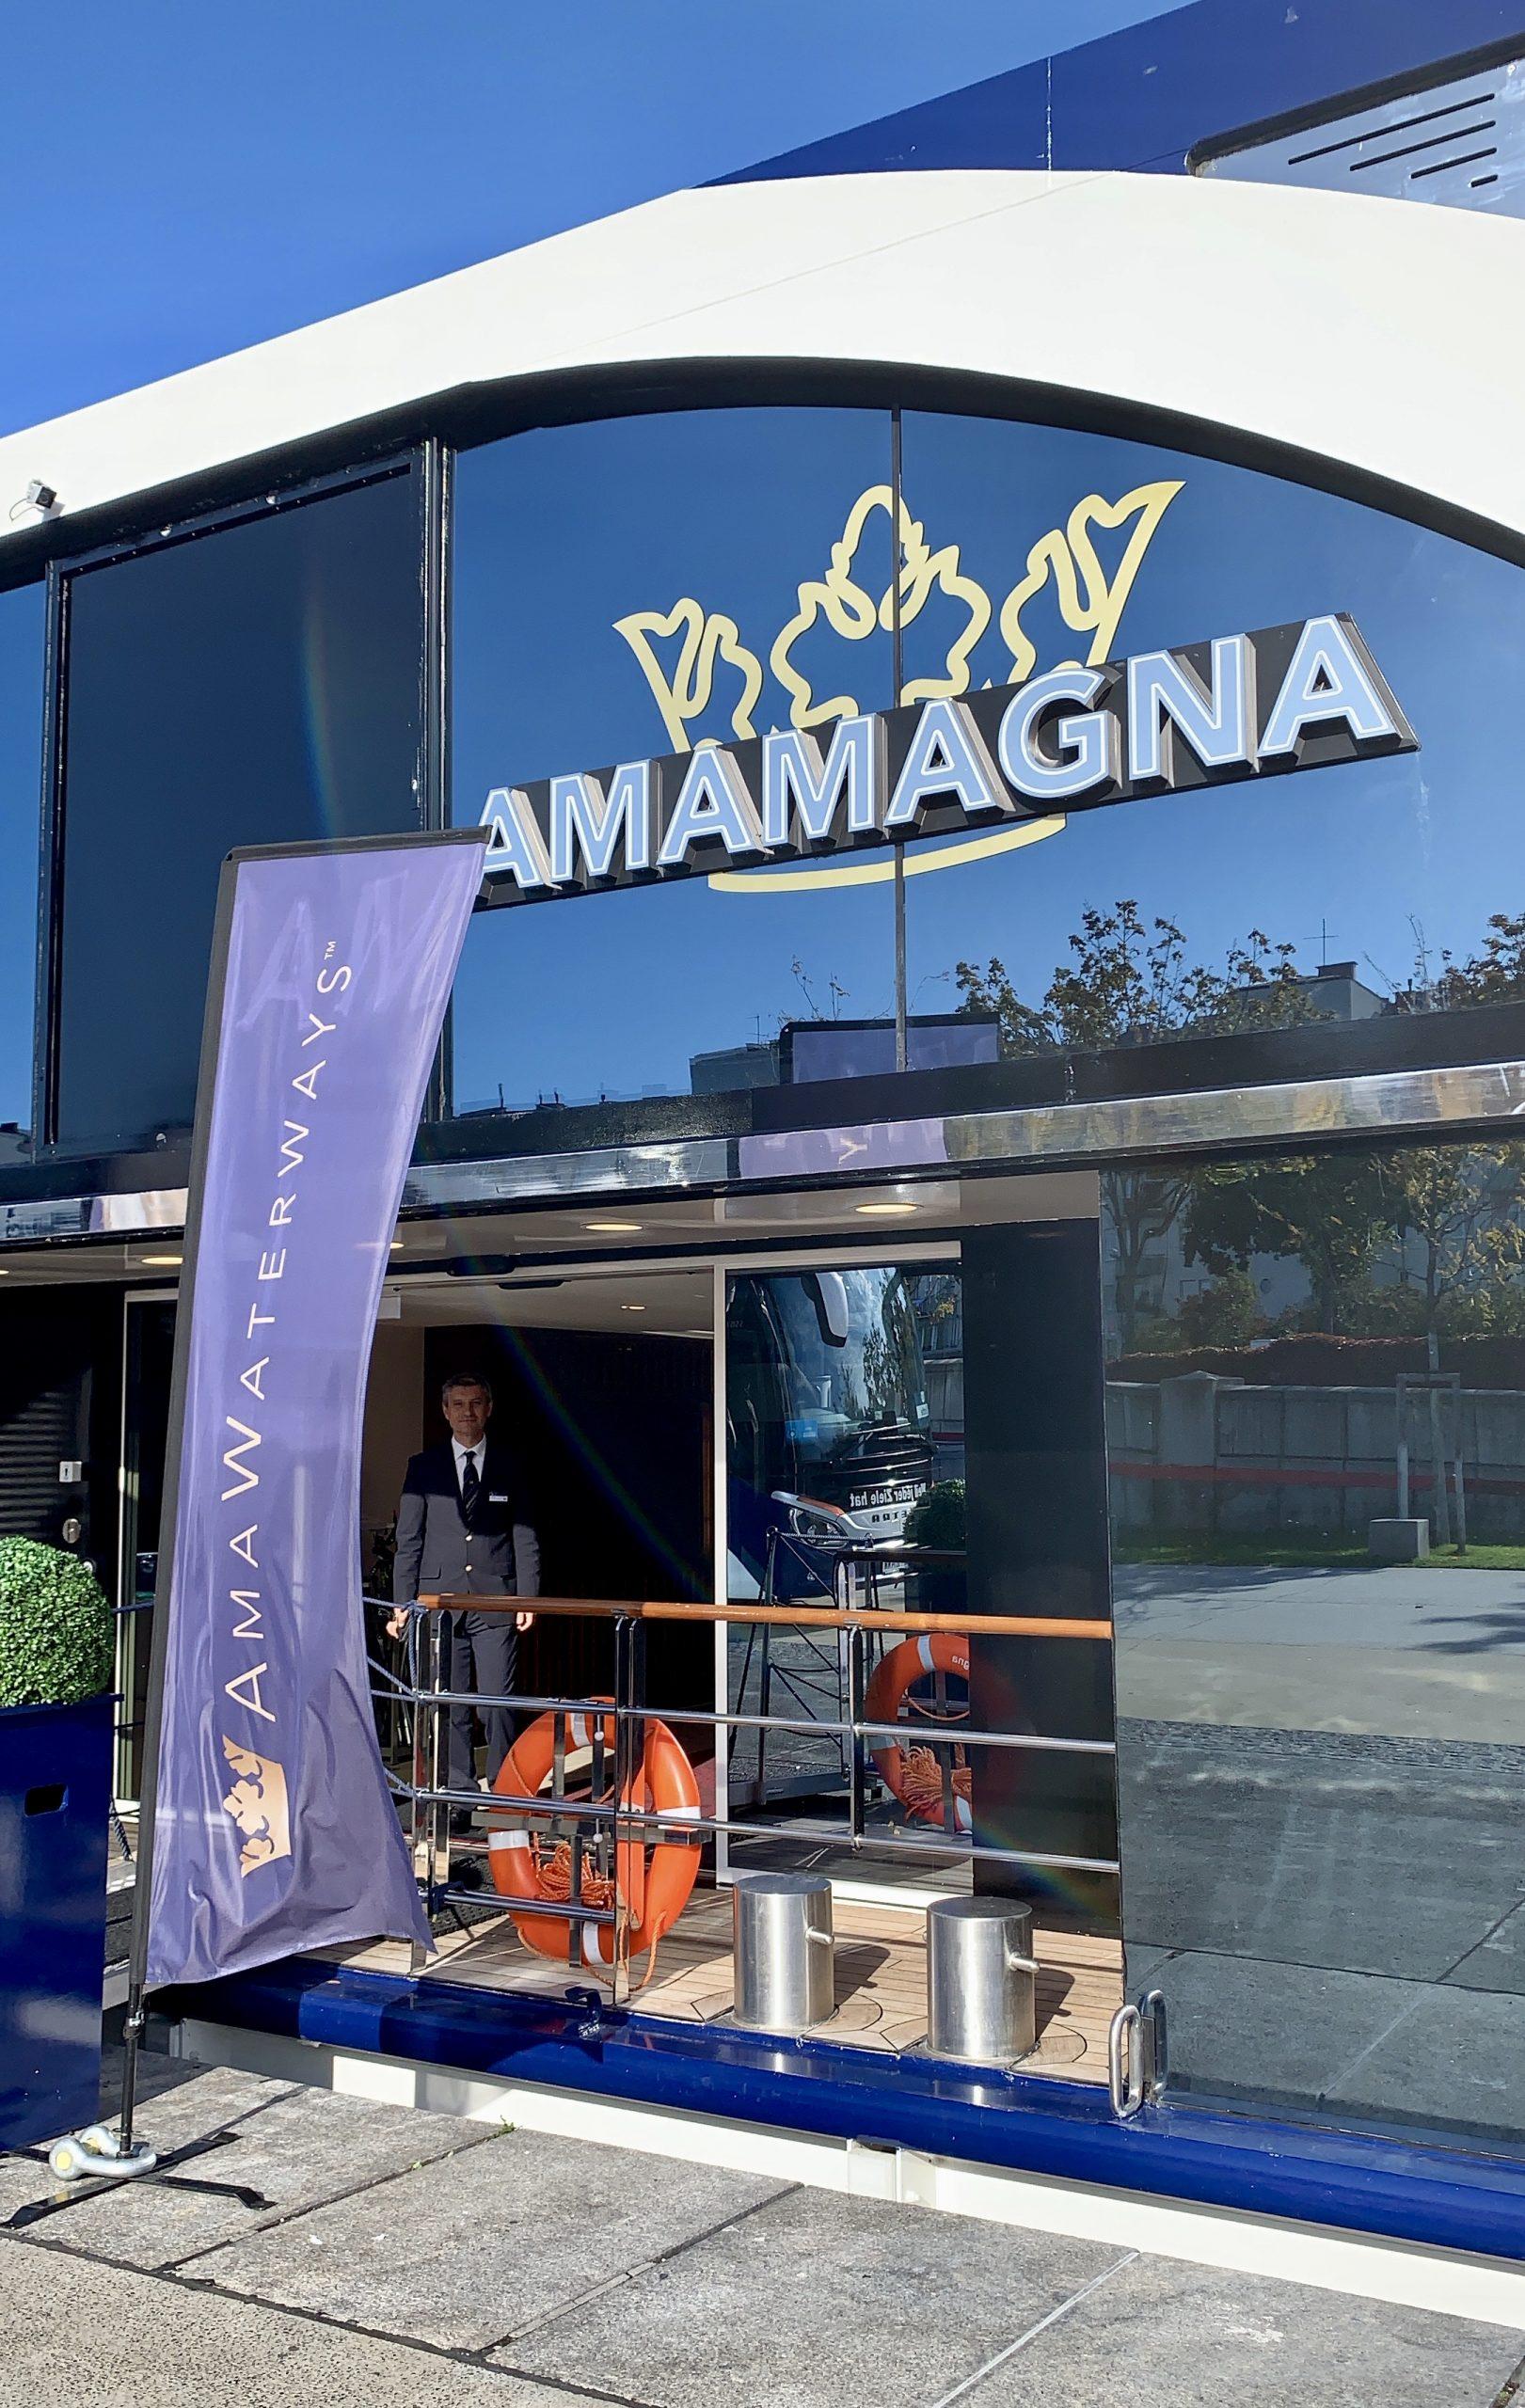 AmaMagna visiting Weissenkirchen